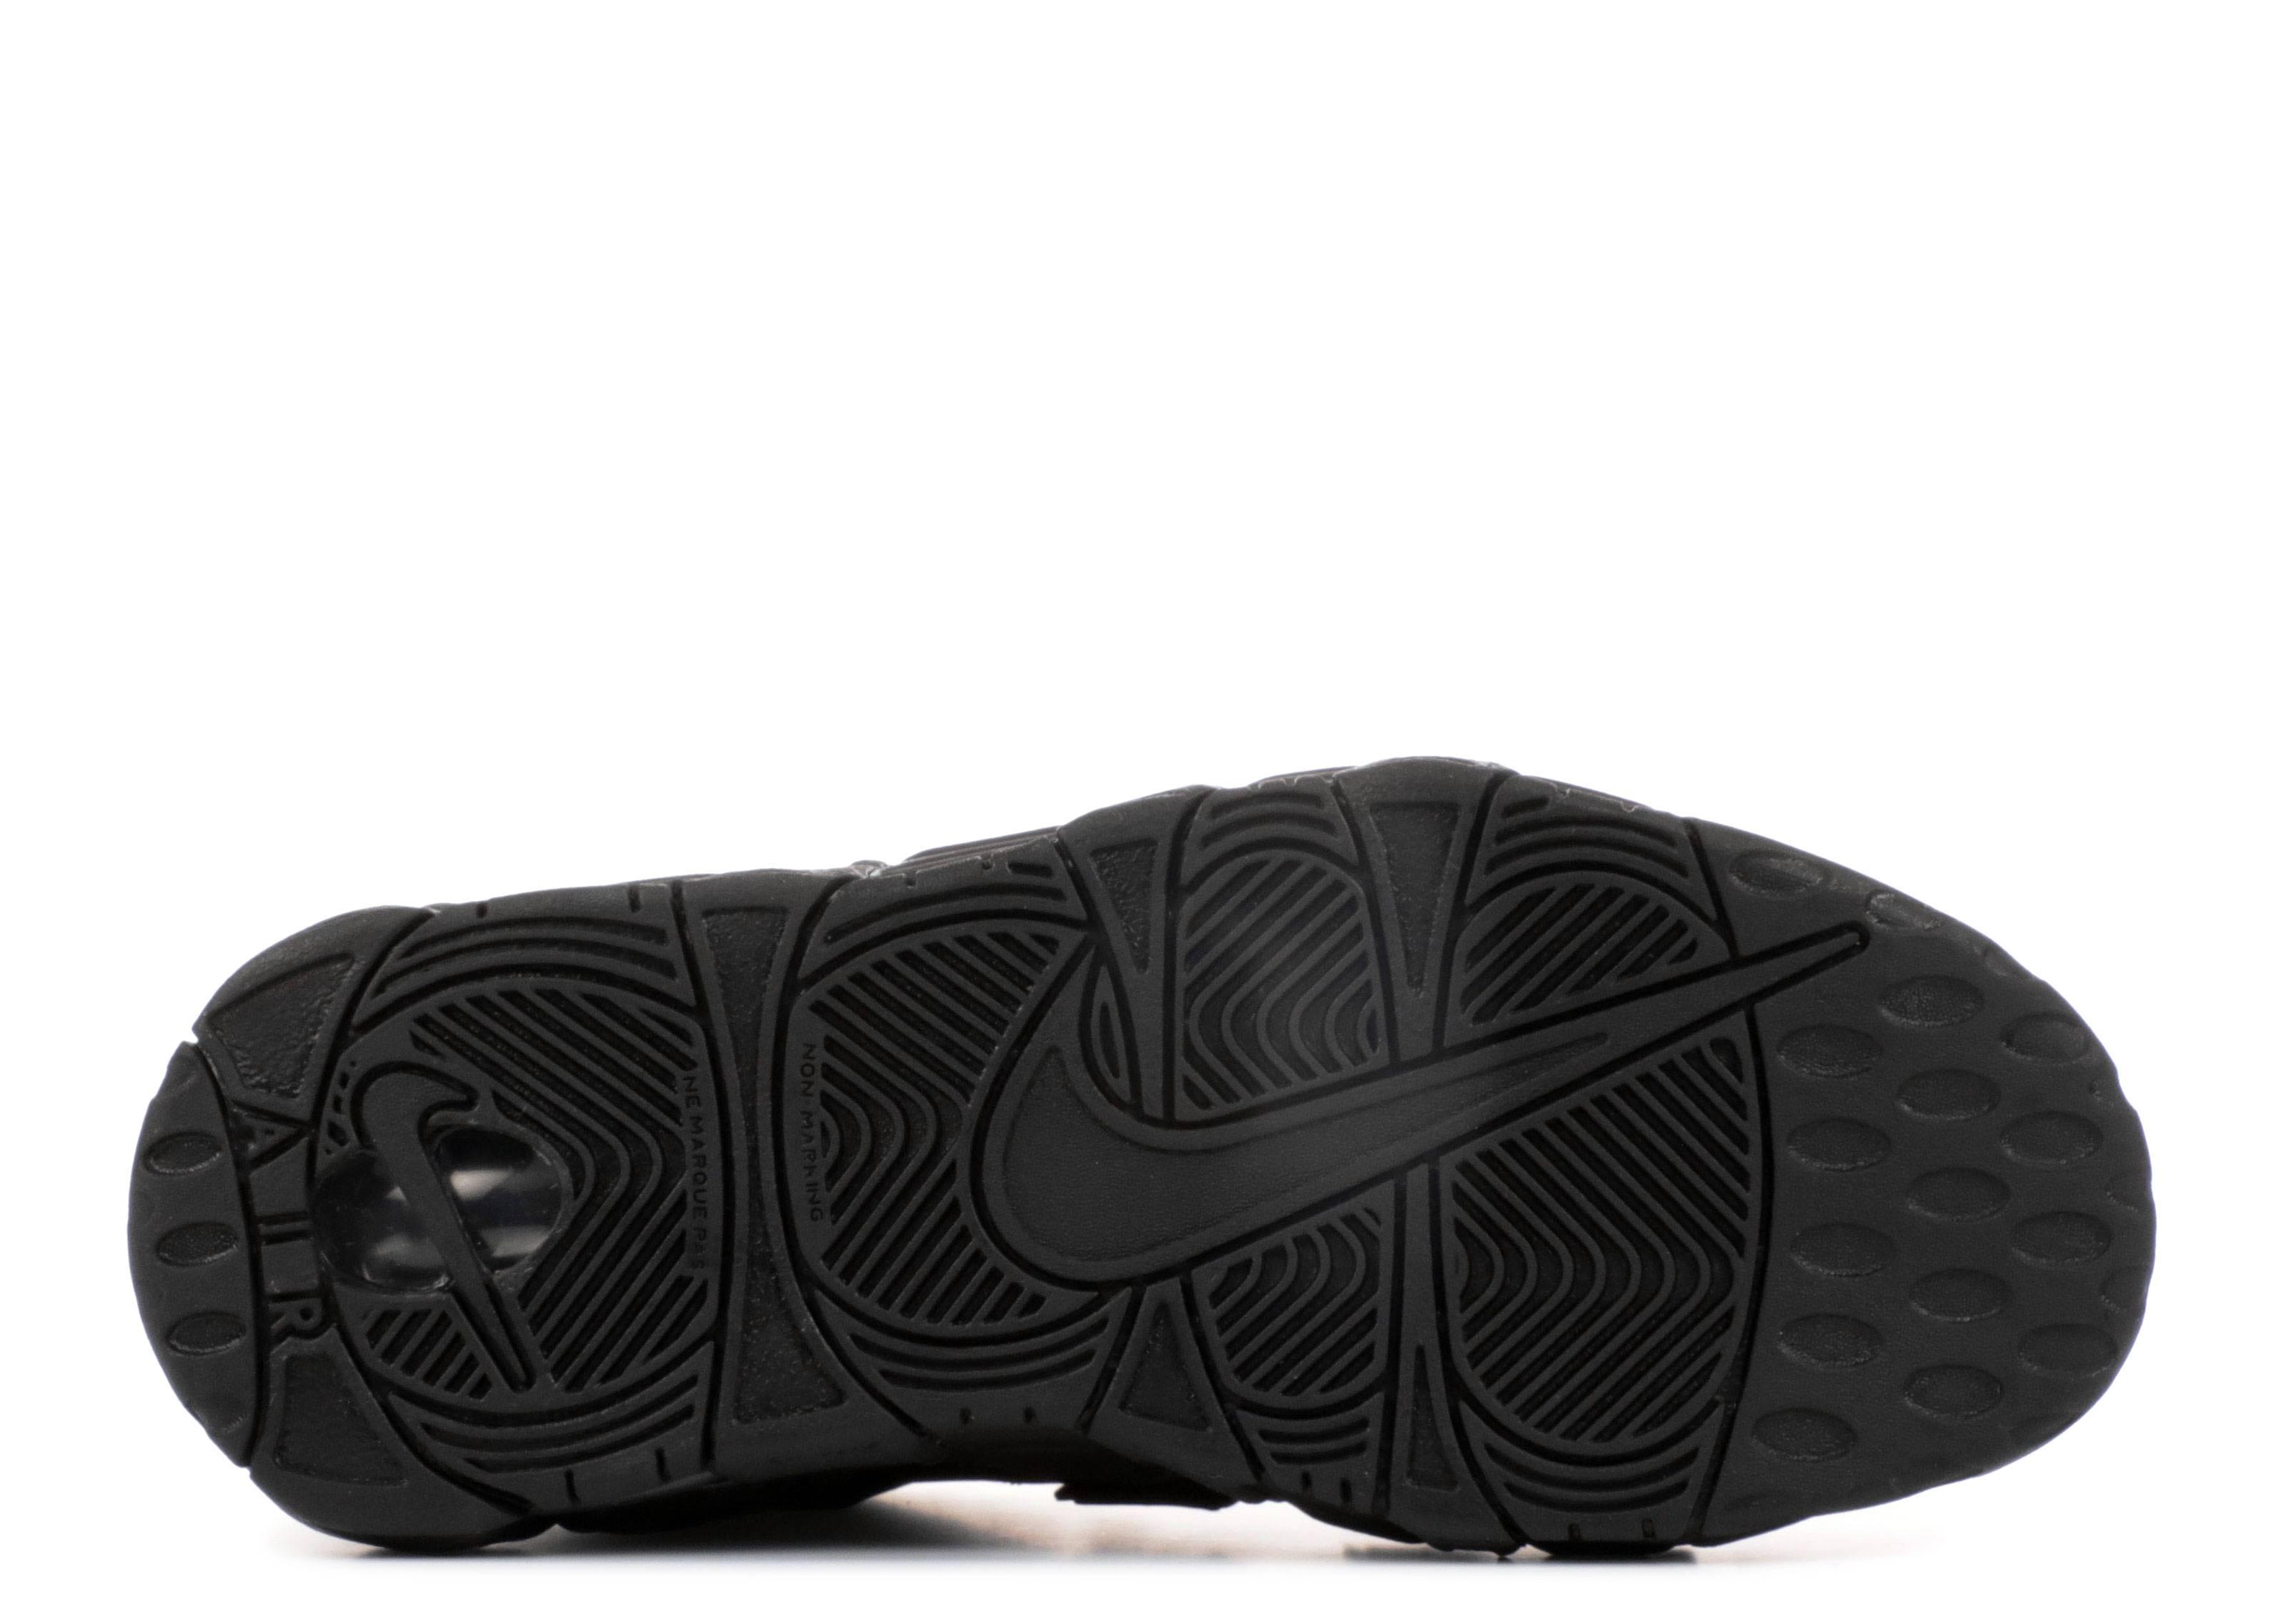 Nike Air More Uptempo Se (gs) - Nike - 922845 001 - black   black ... 4a6aed6a9ab4